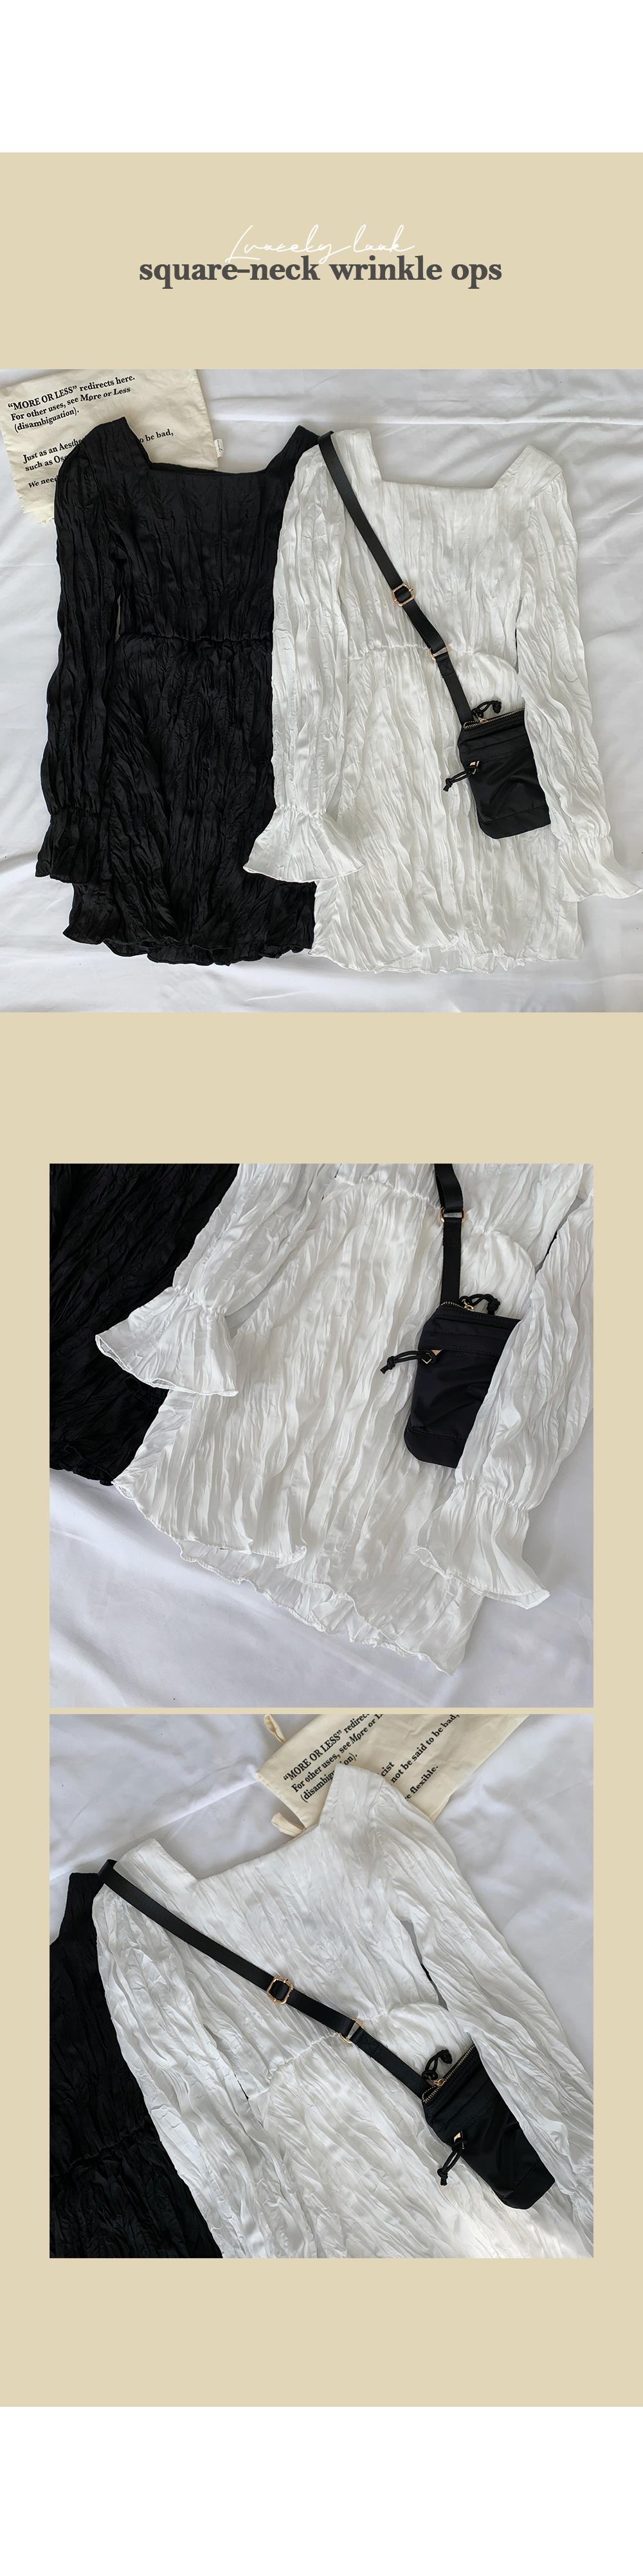 Angel Square Wrinkle Dress